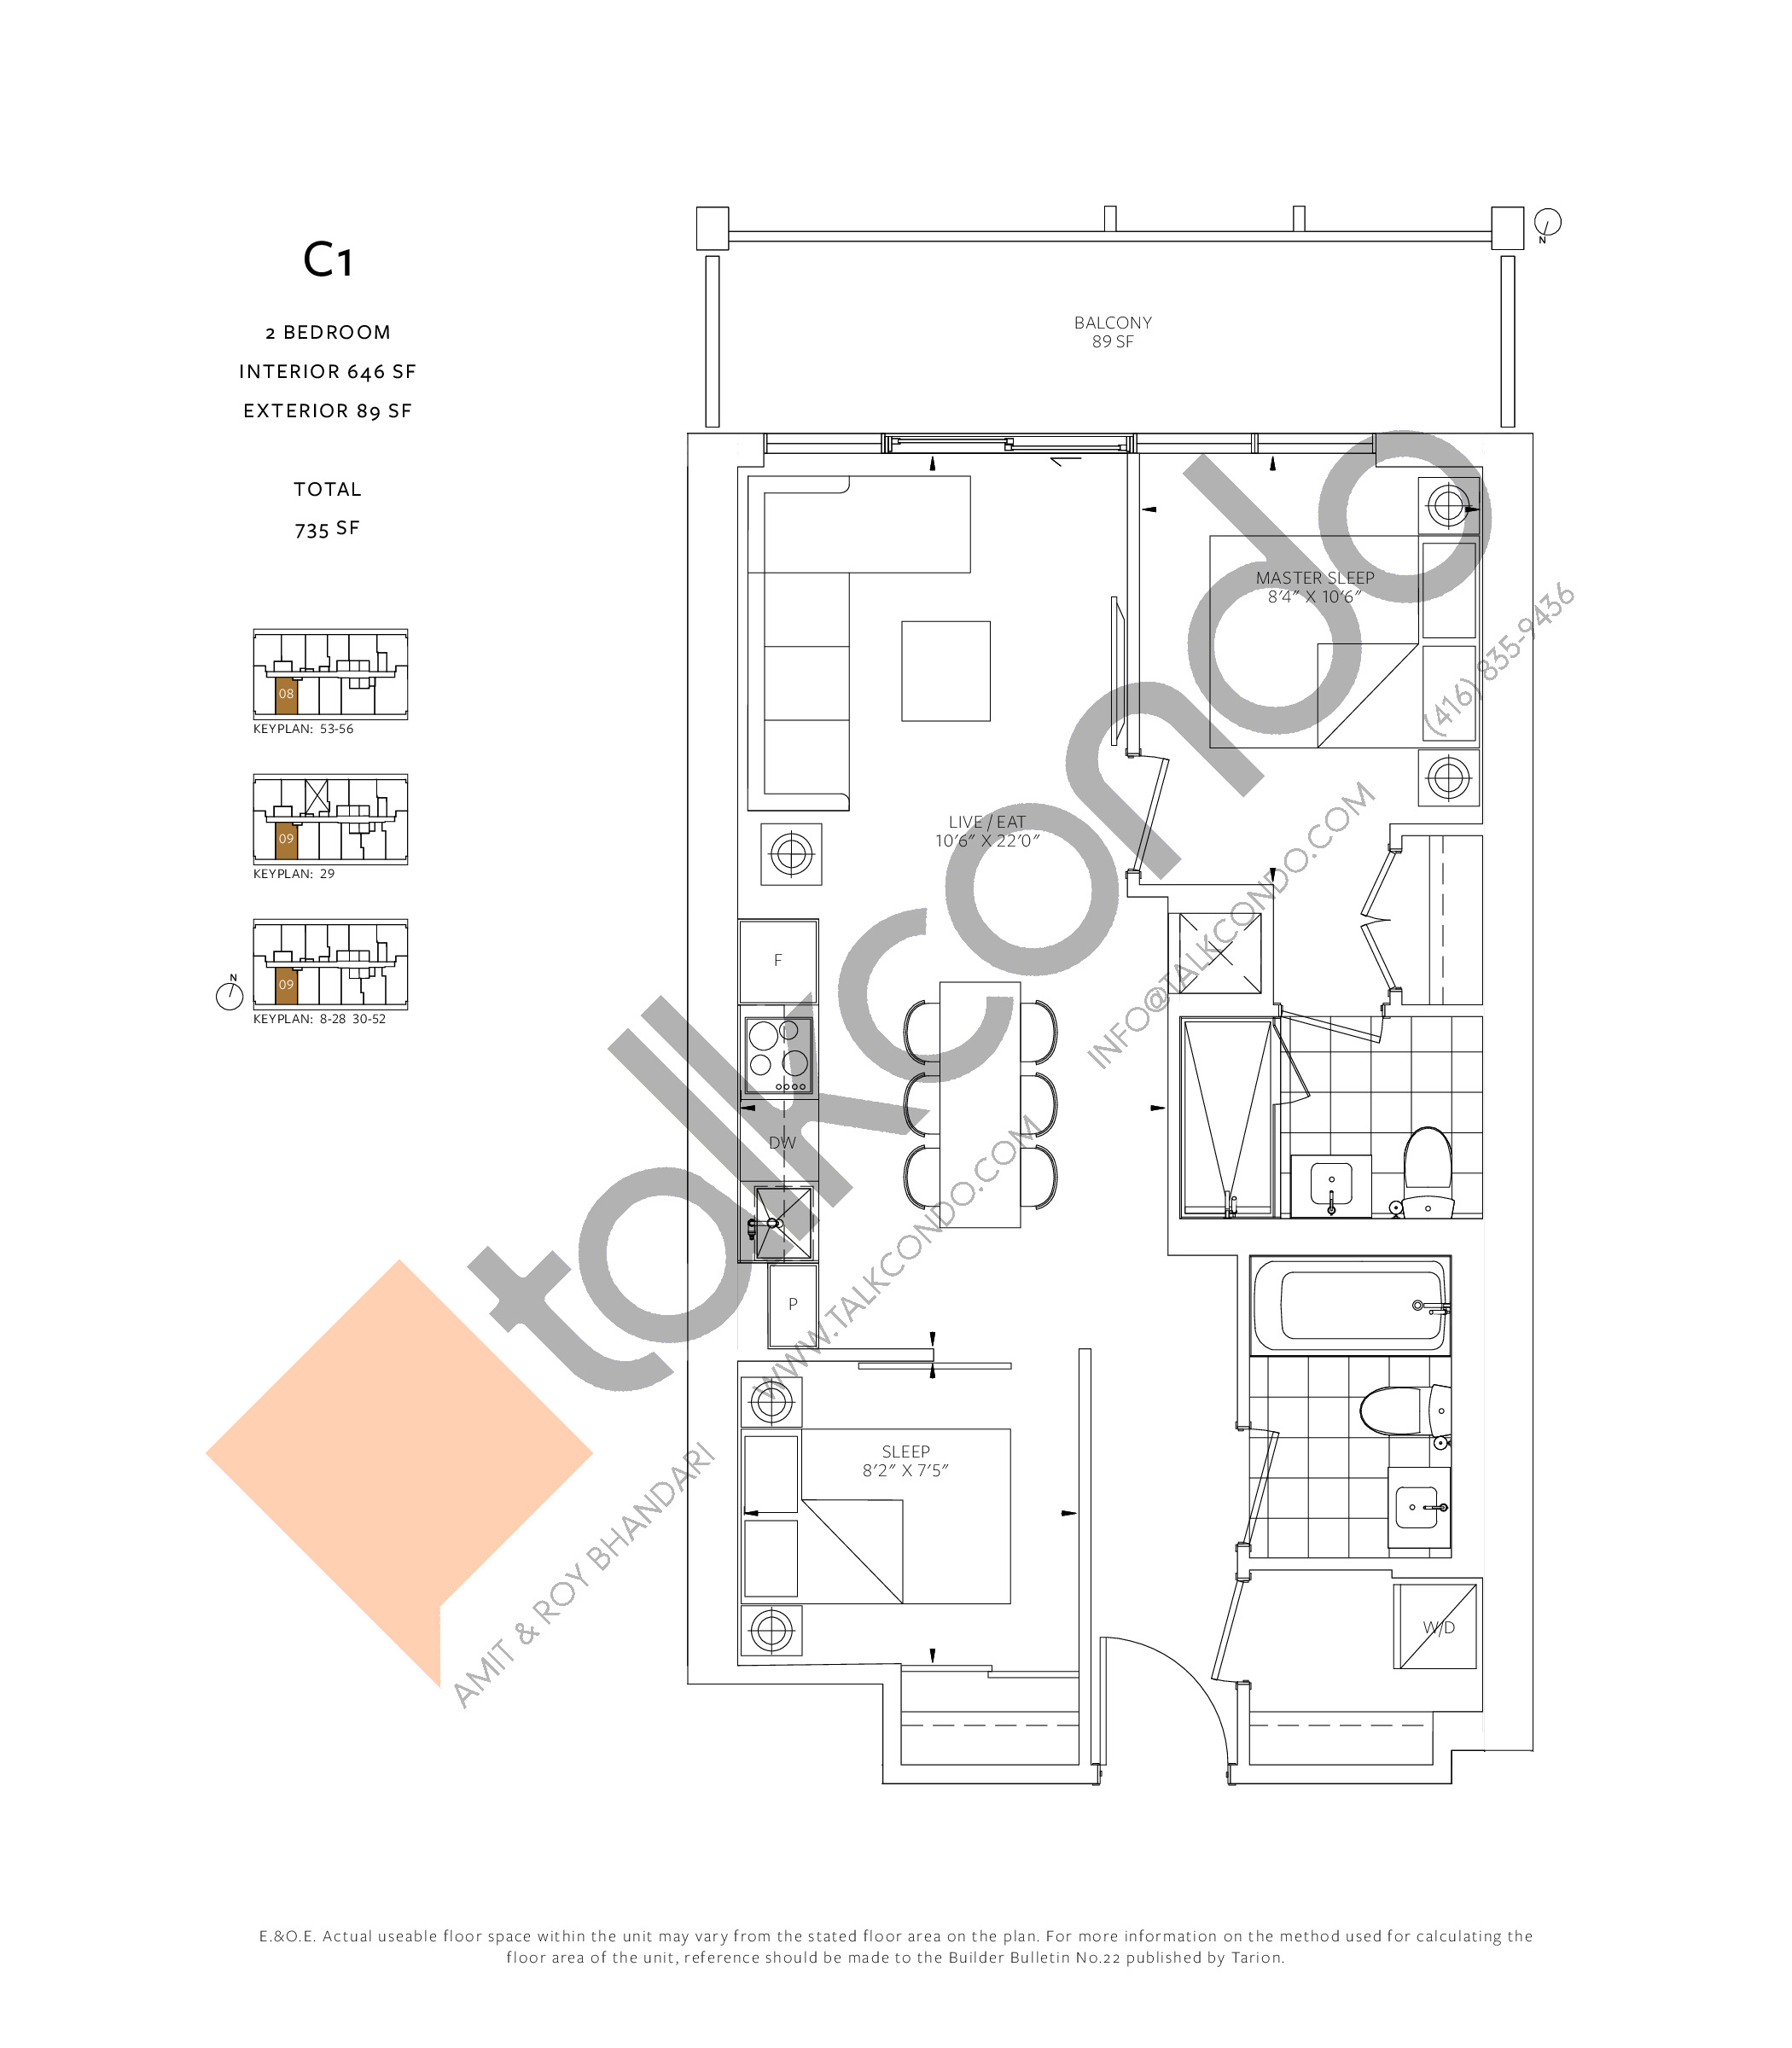 C1 Floor Plan at 88 Queen Condos - 646 sq.ft